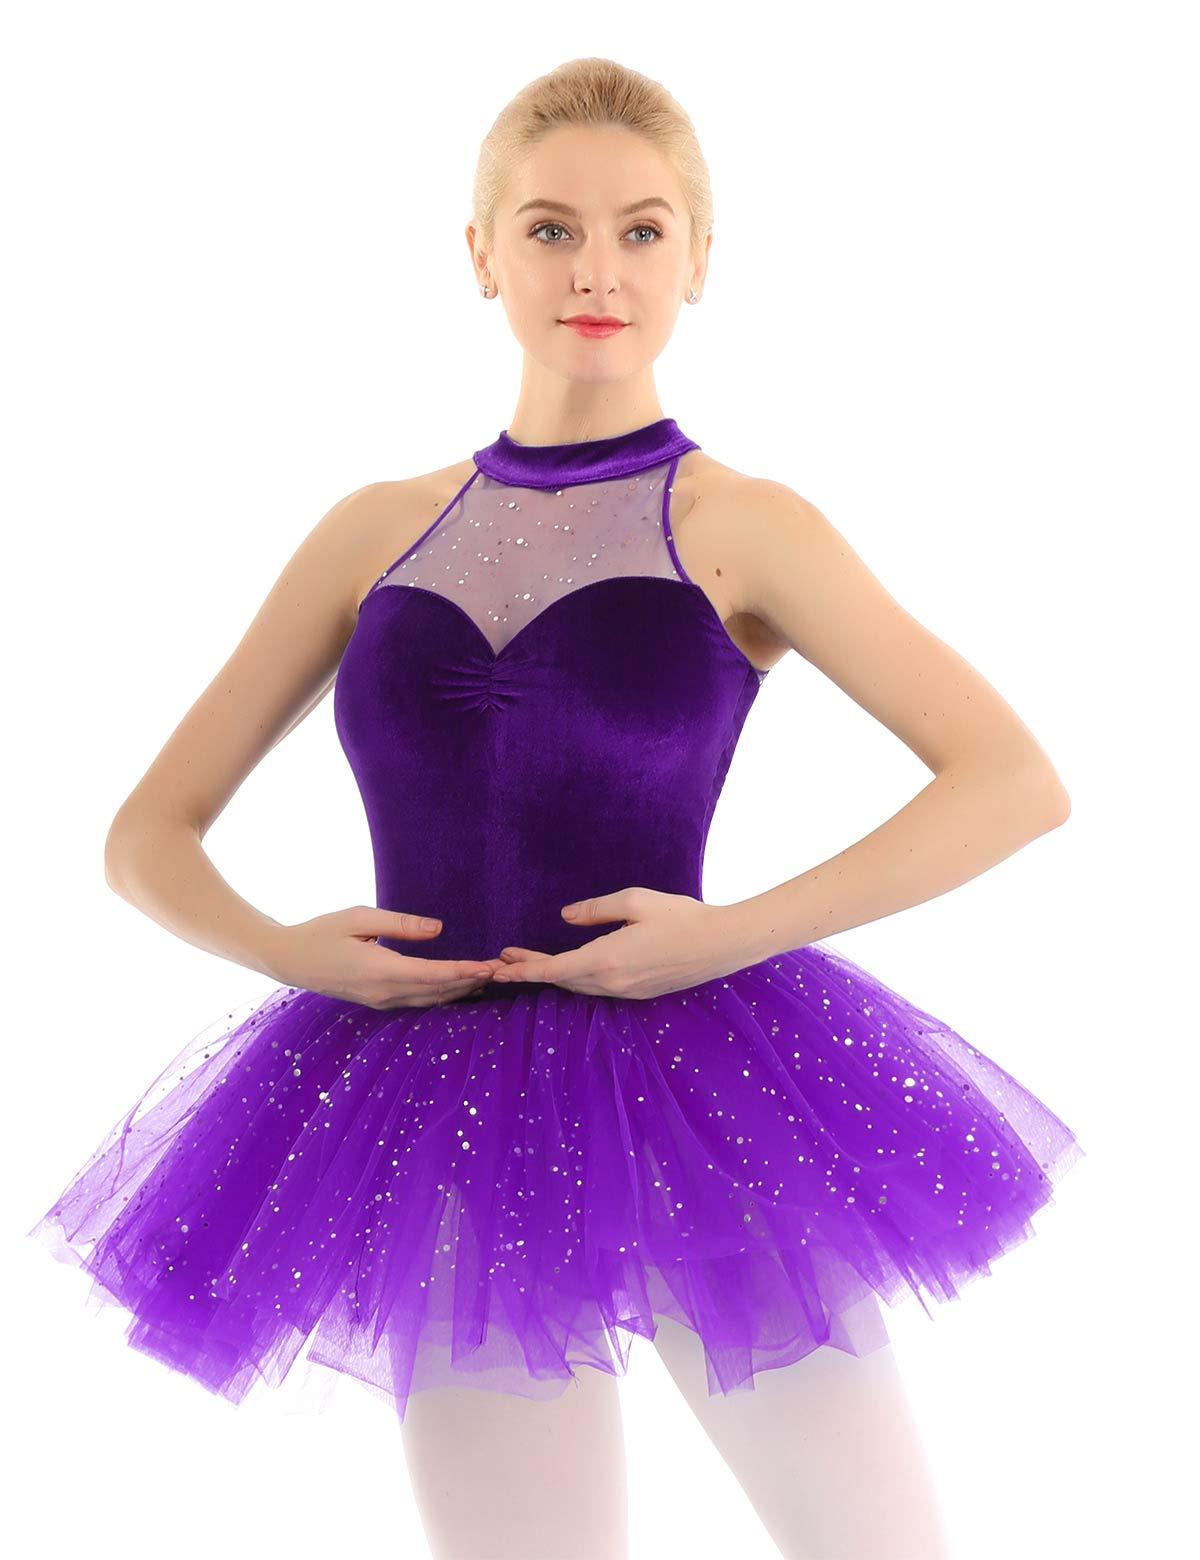 iiniim Women's Ballet Tutu Costume Black Swan Lake Dance Leotard Dress Purple Sequins M by iiniim